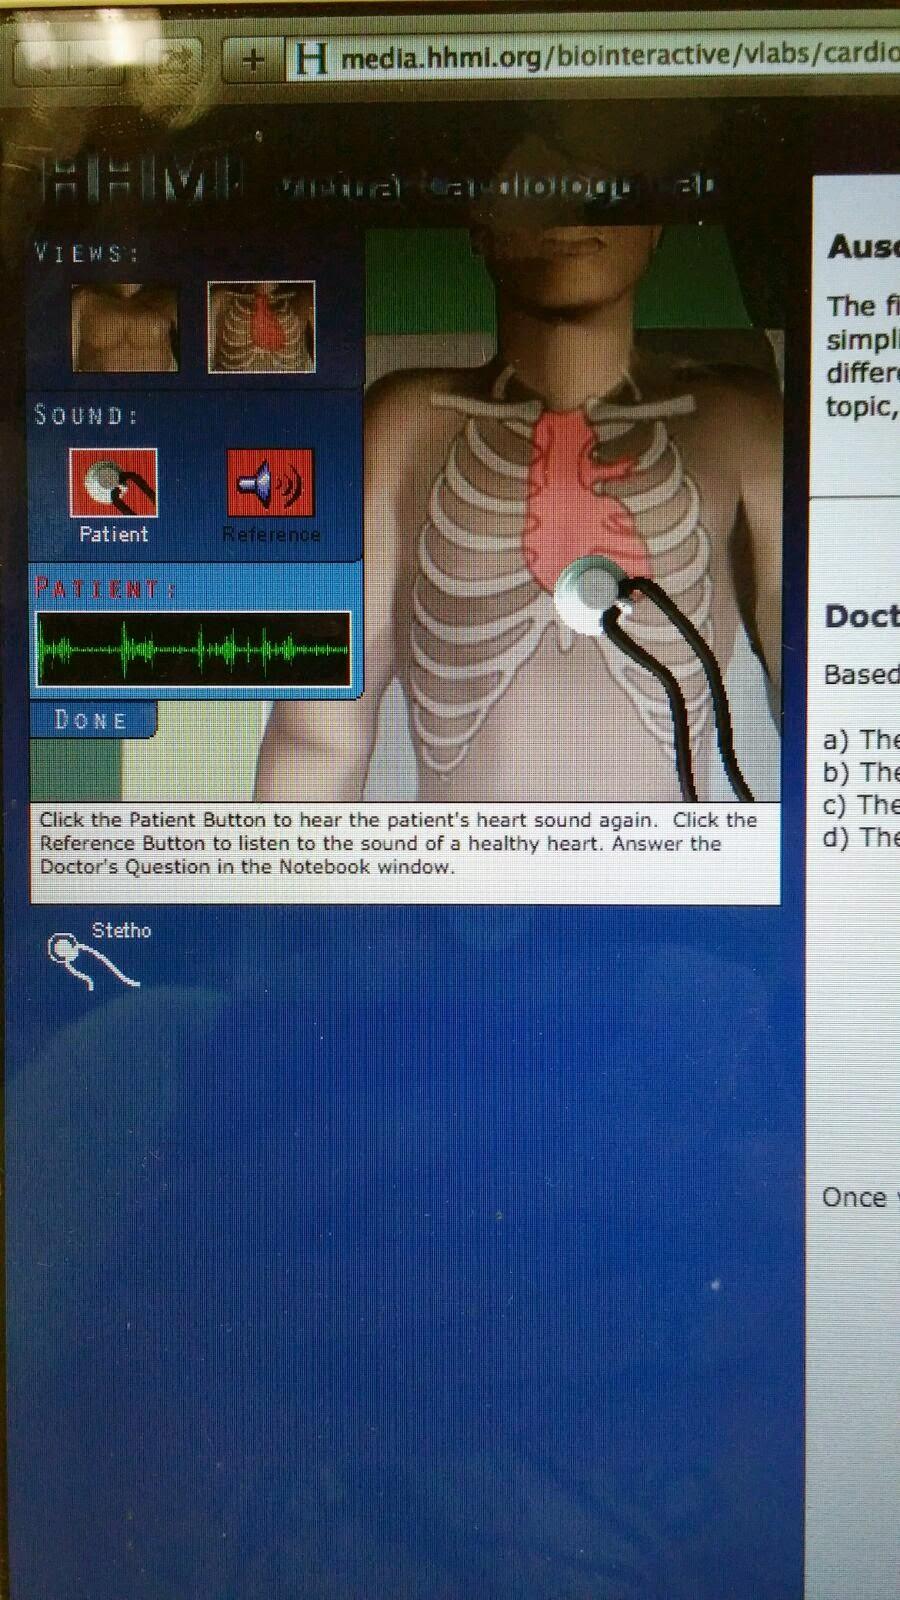 Human Anatomy & Physiology: Virtual Cardiology Lab